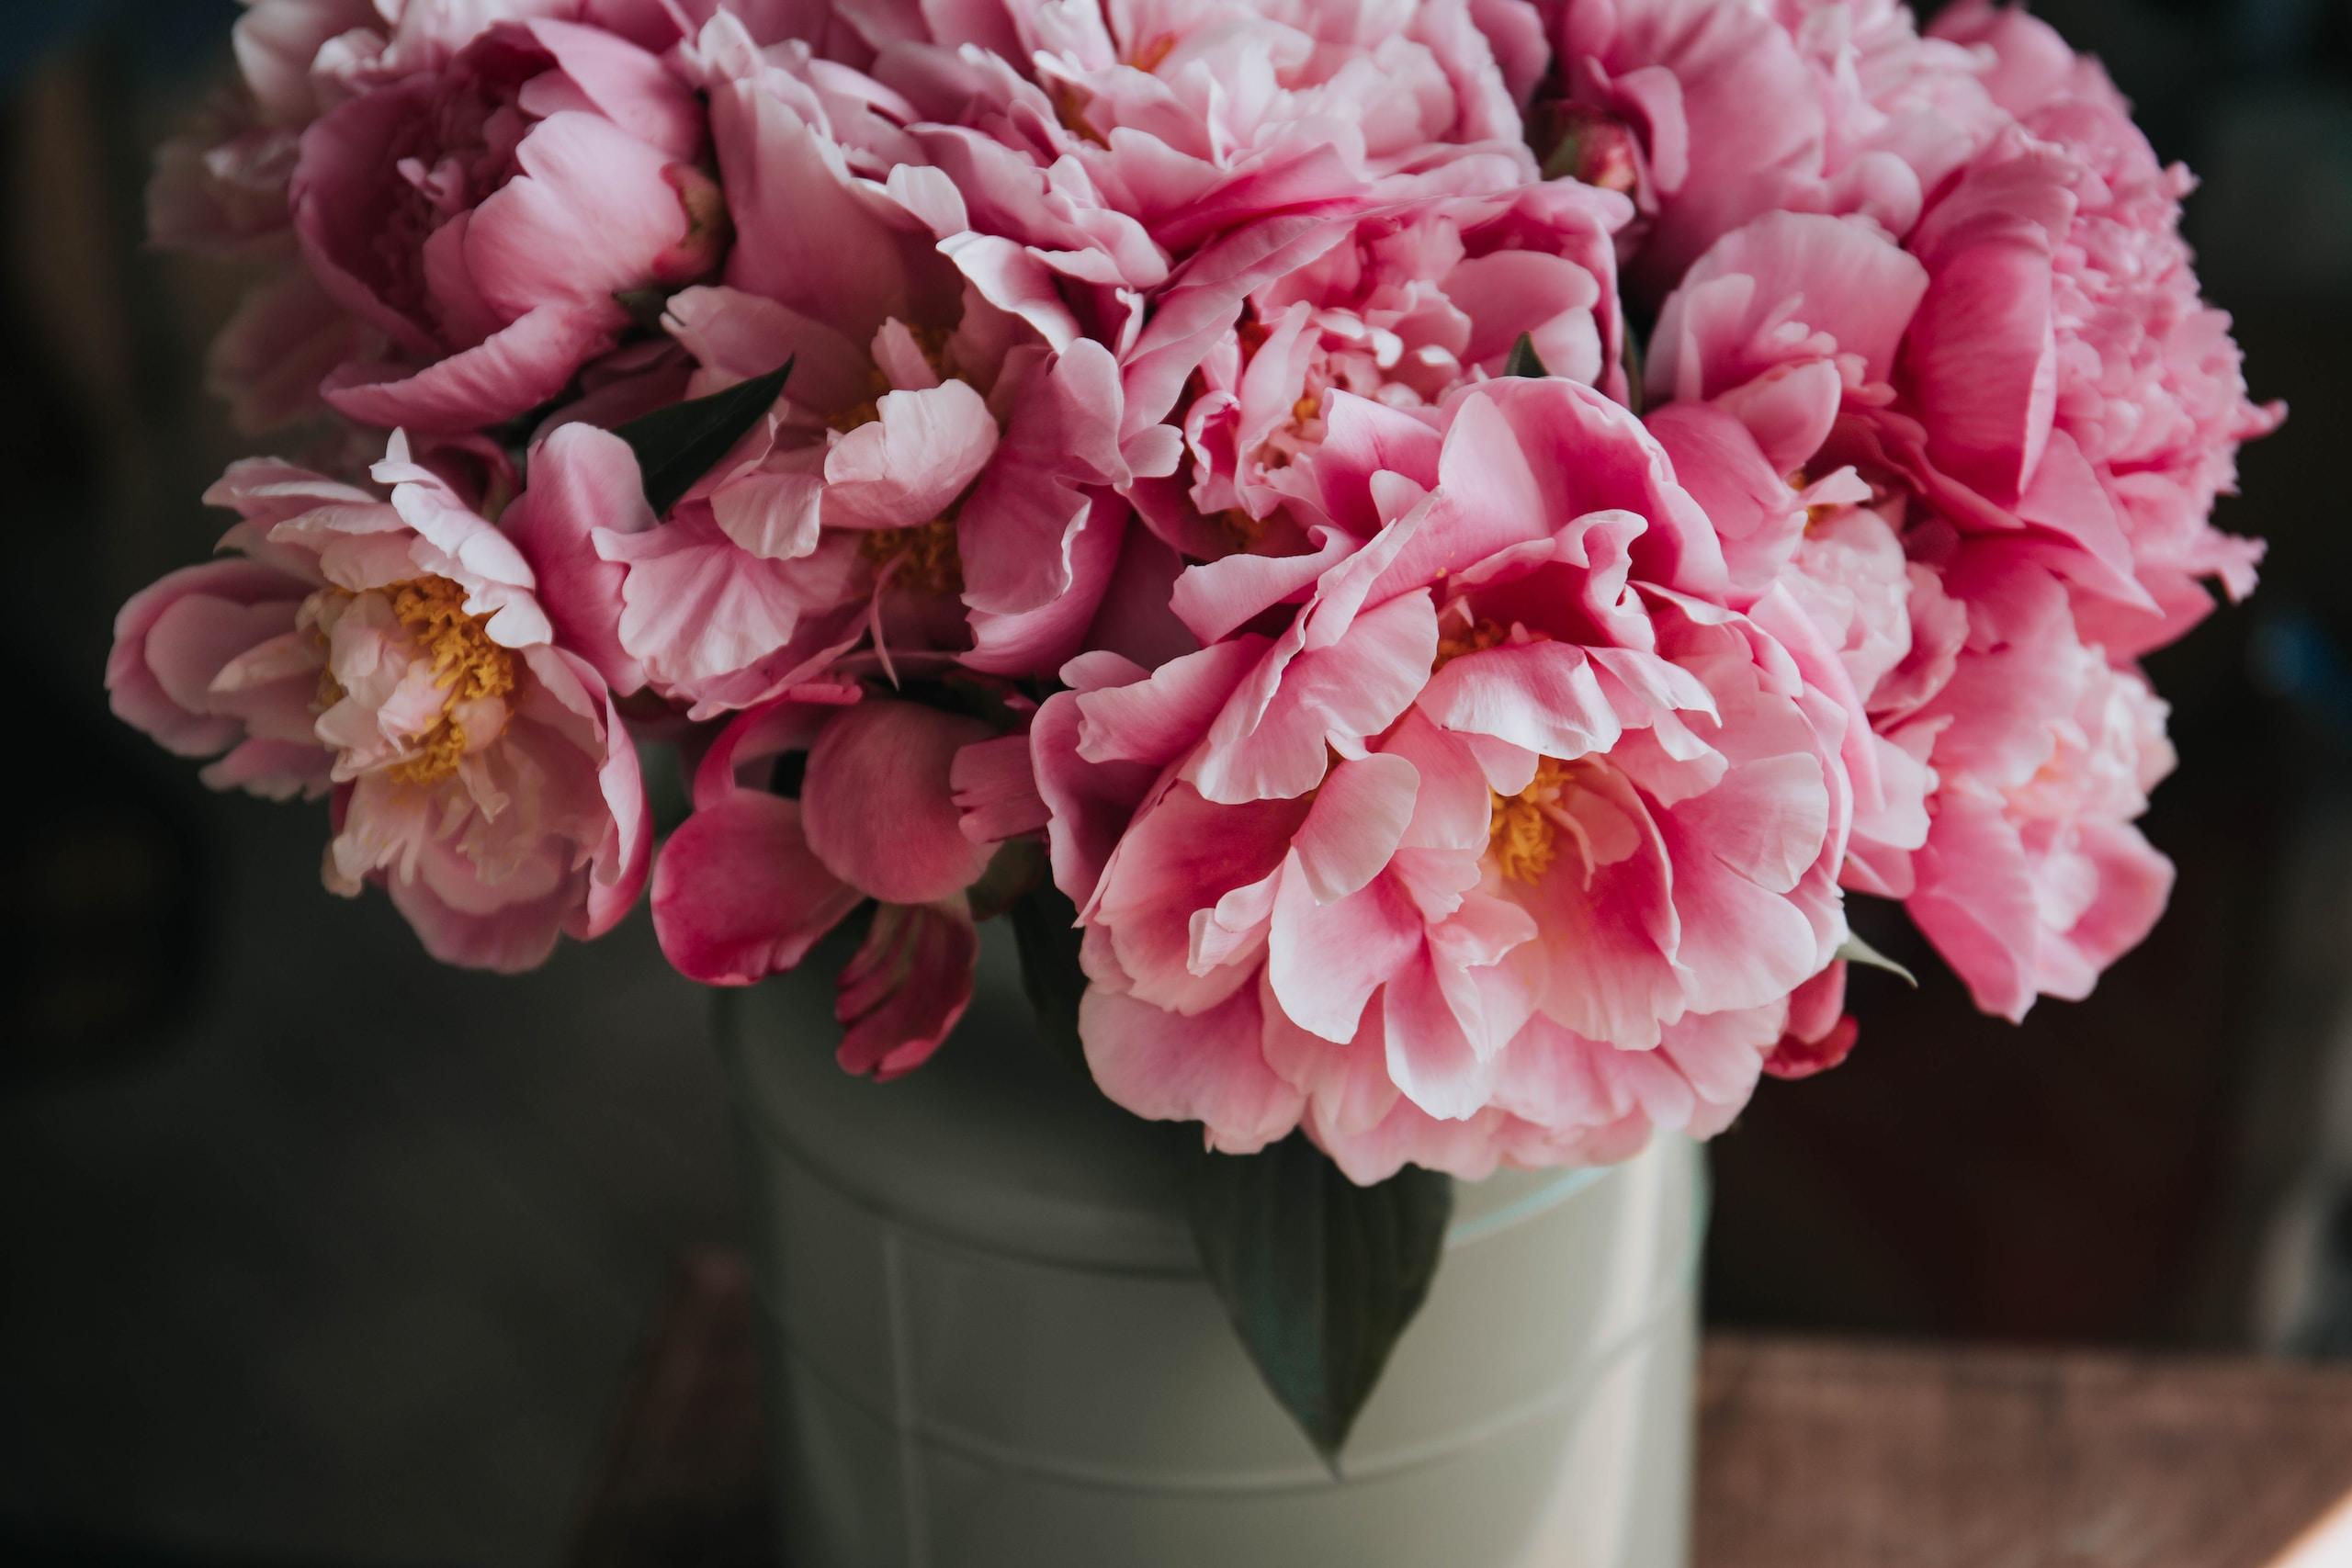 Floriography, the secret language of flowers